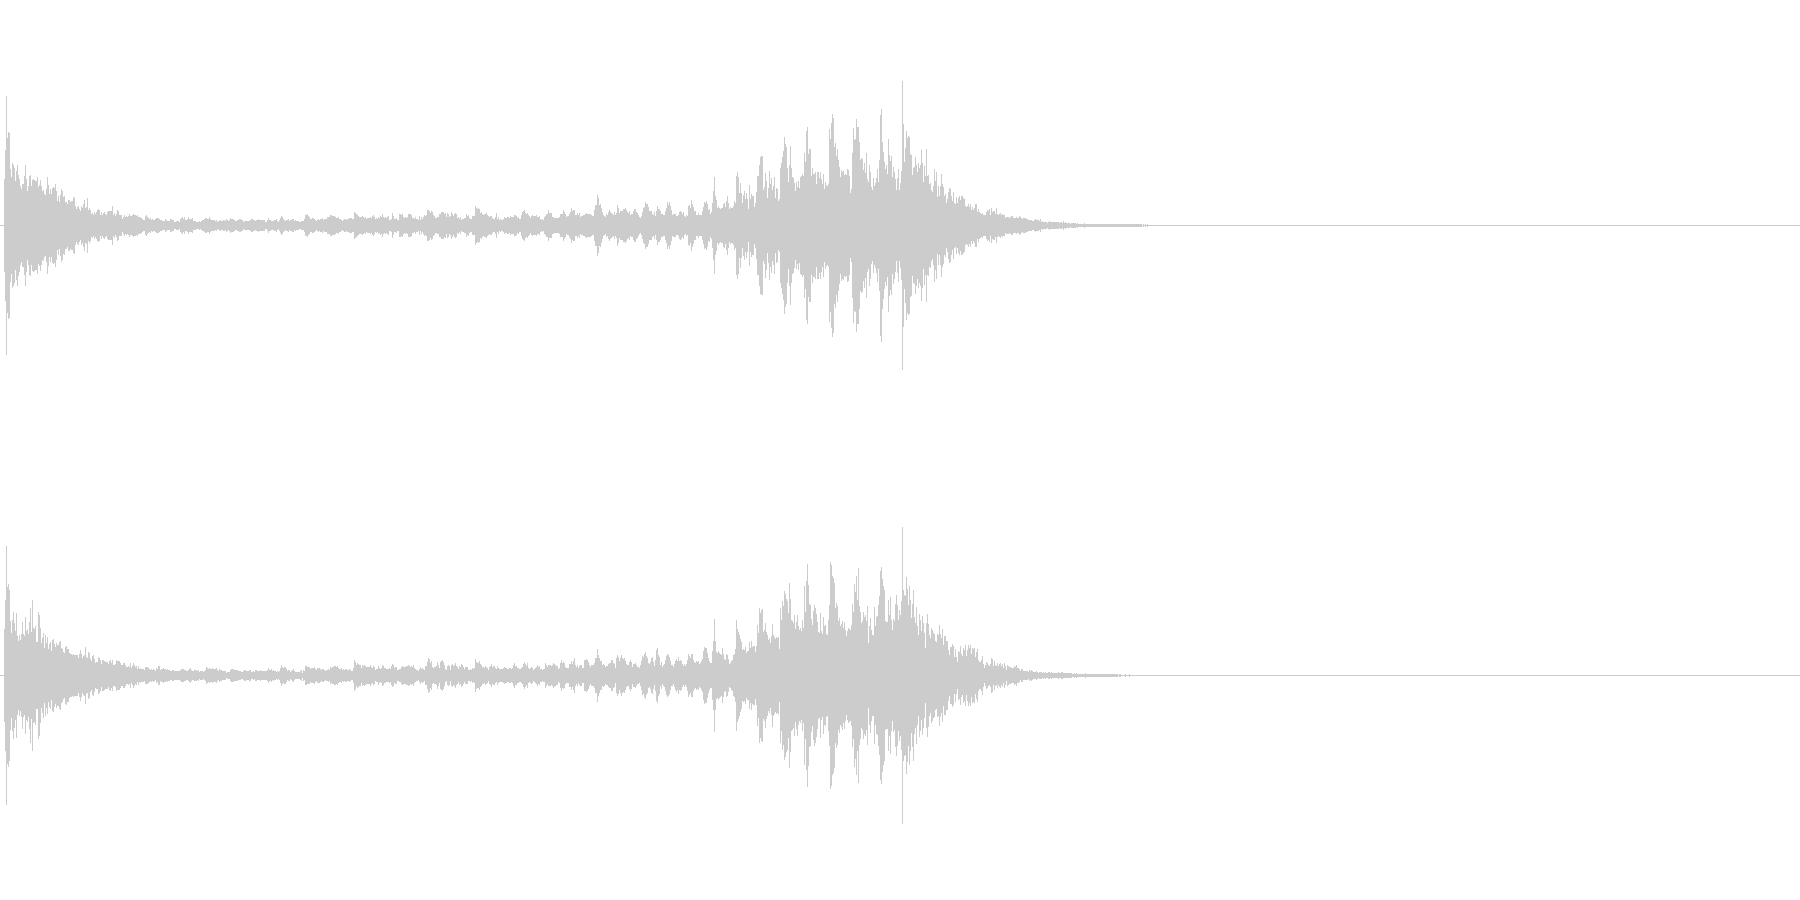 生演奏 琵琶 和風 古典風 残響有#13の未再生の波形